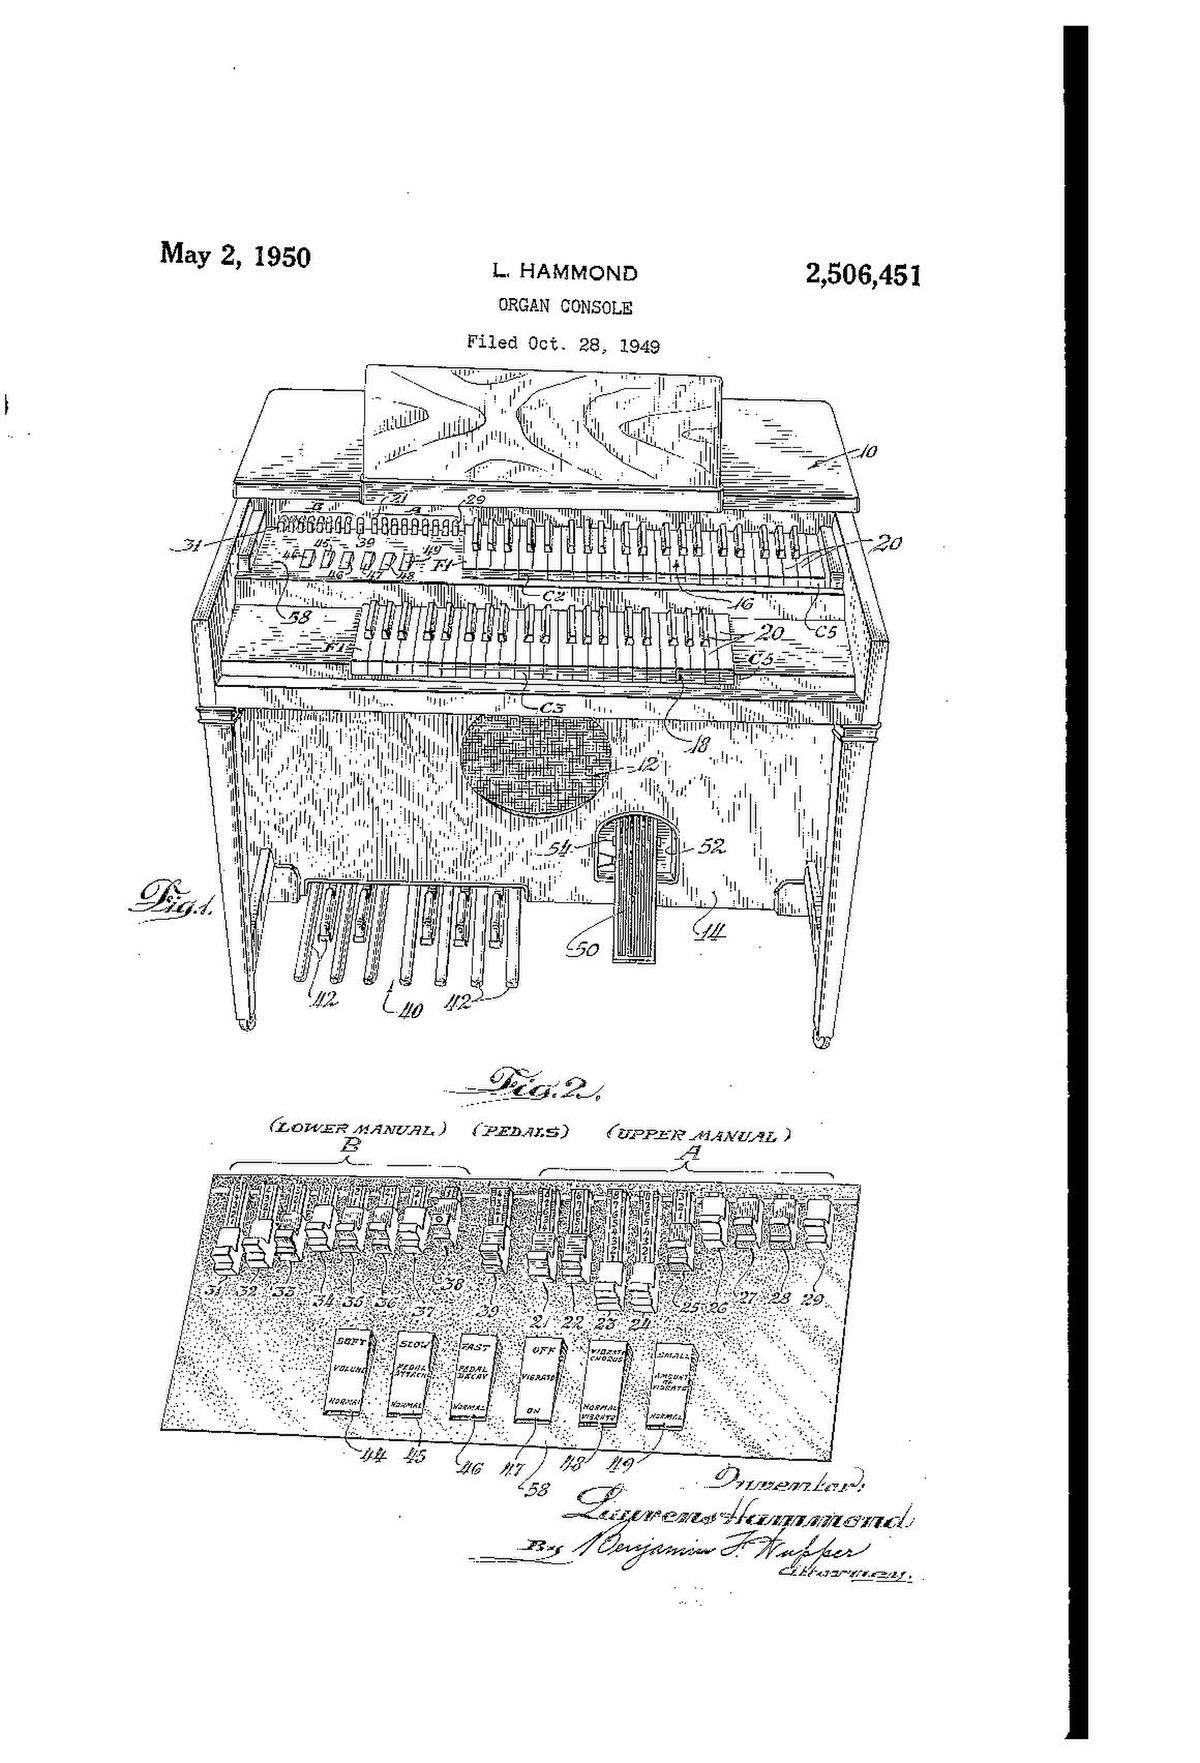 File:US2506451A Organ Console (1949-10-28 filed, 1950-05-02 ...